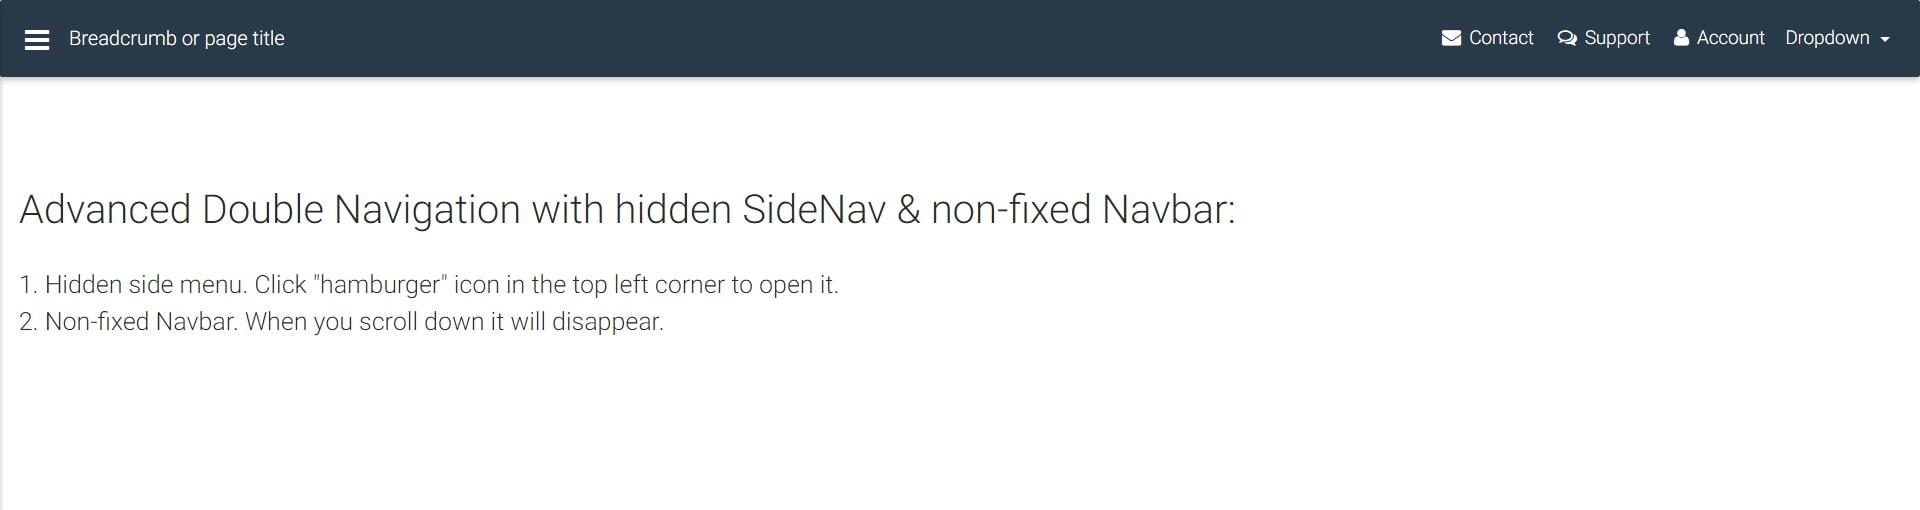 Display of double navigation with hidden SideNav & non-fixed Navbar